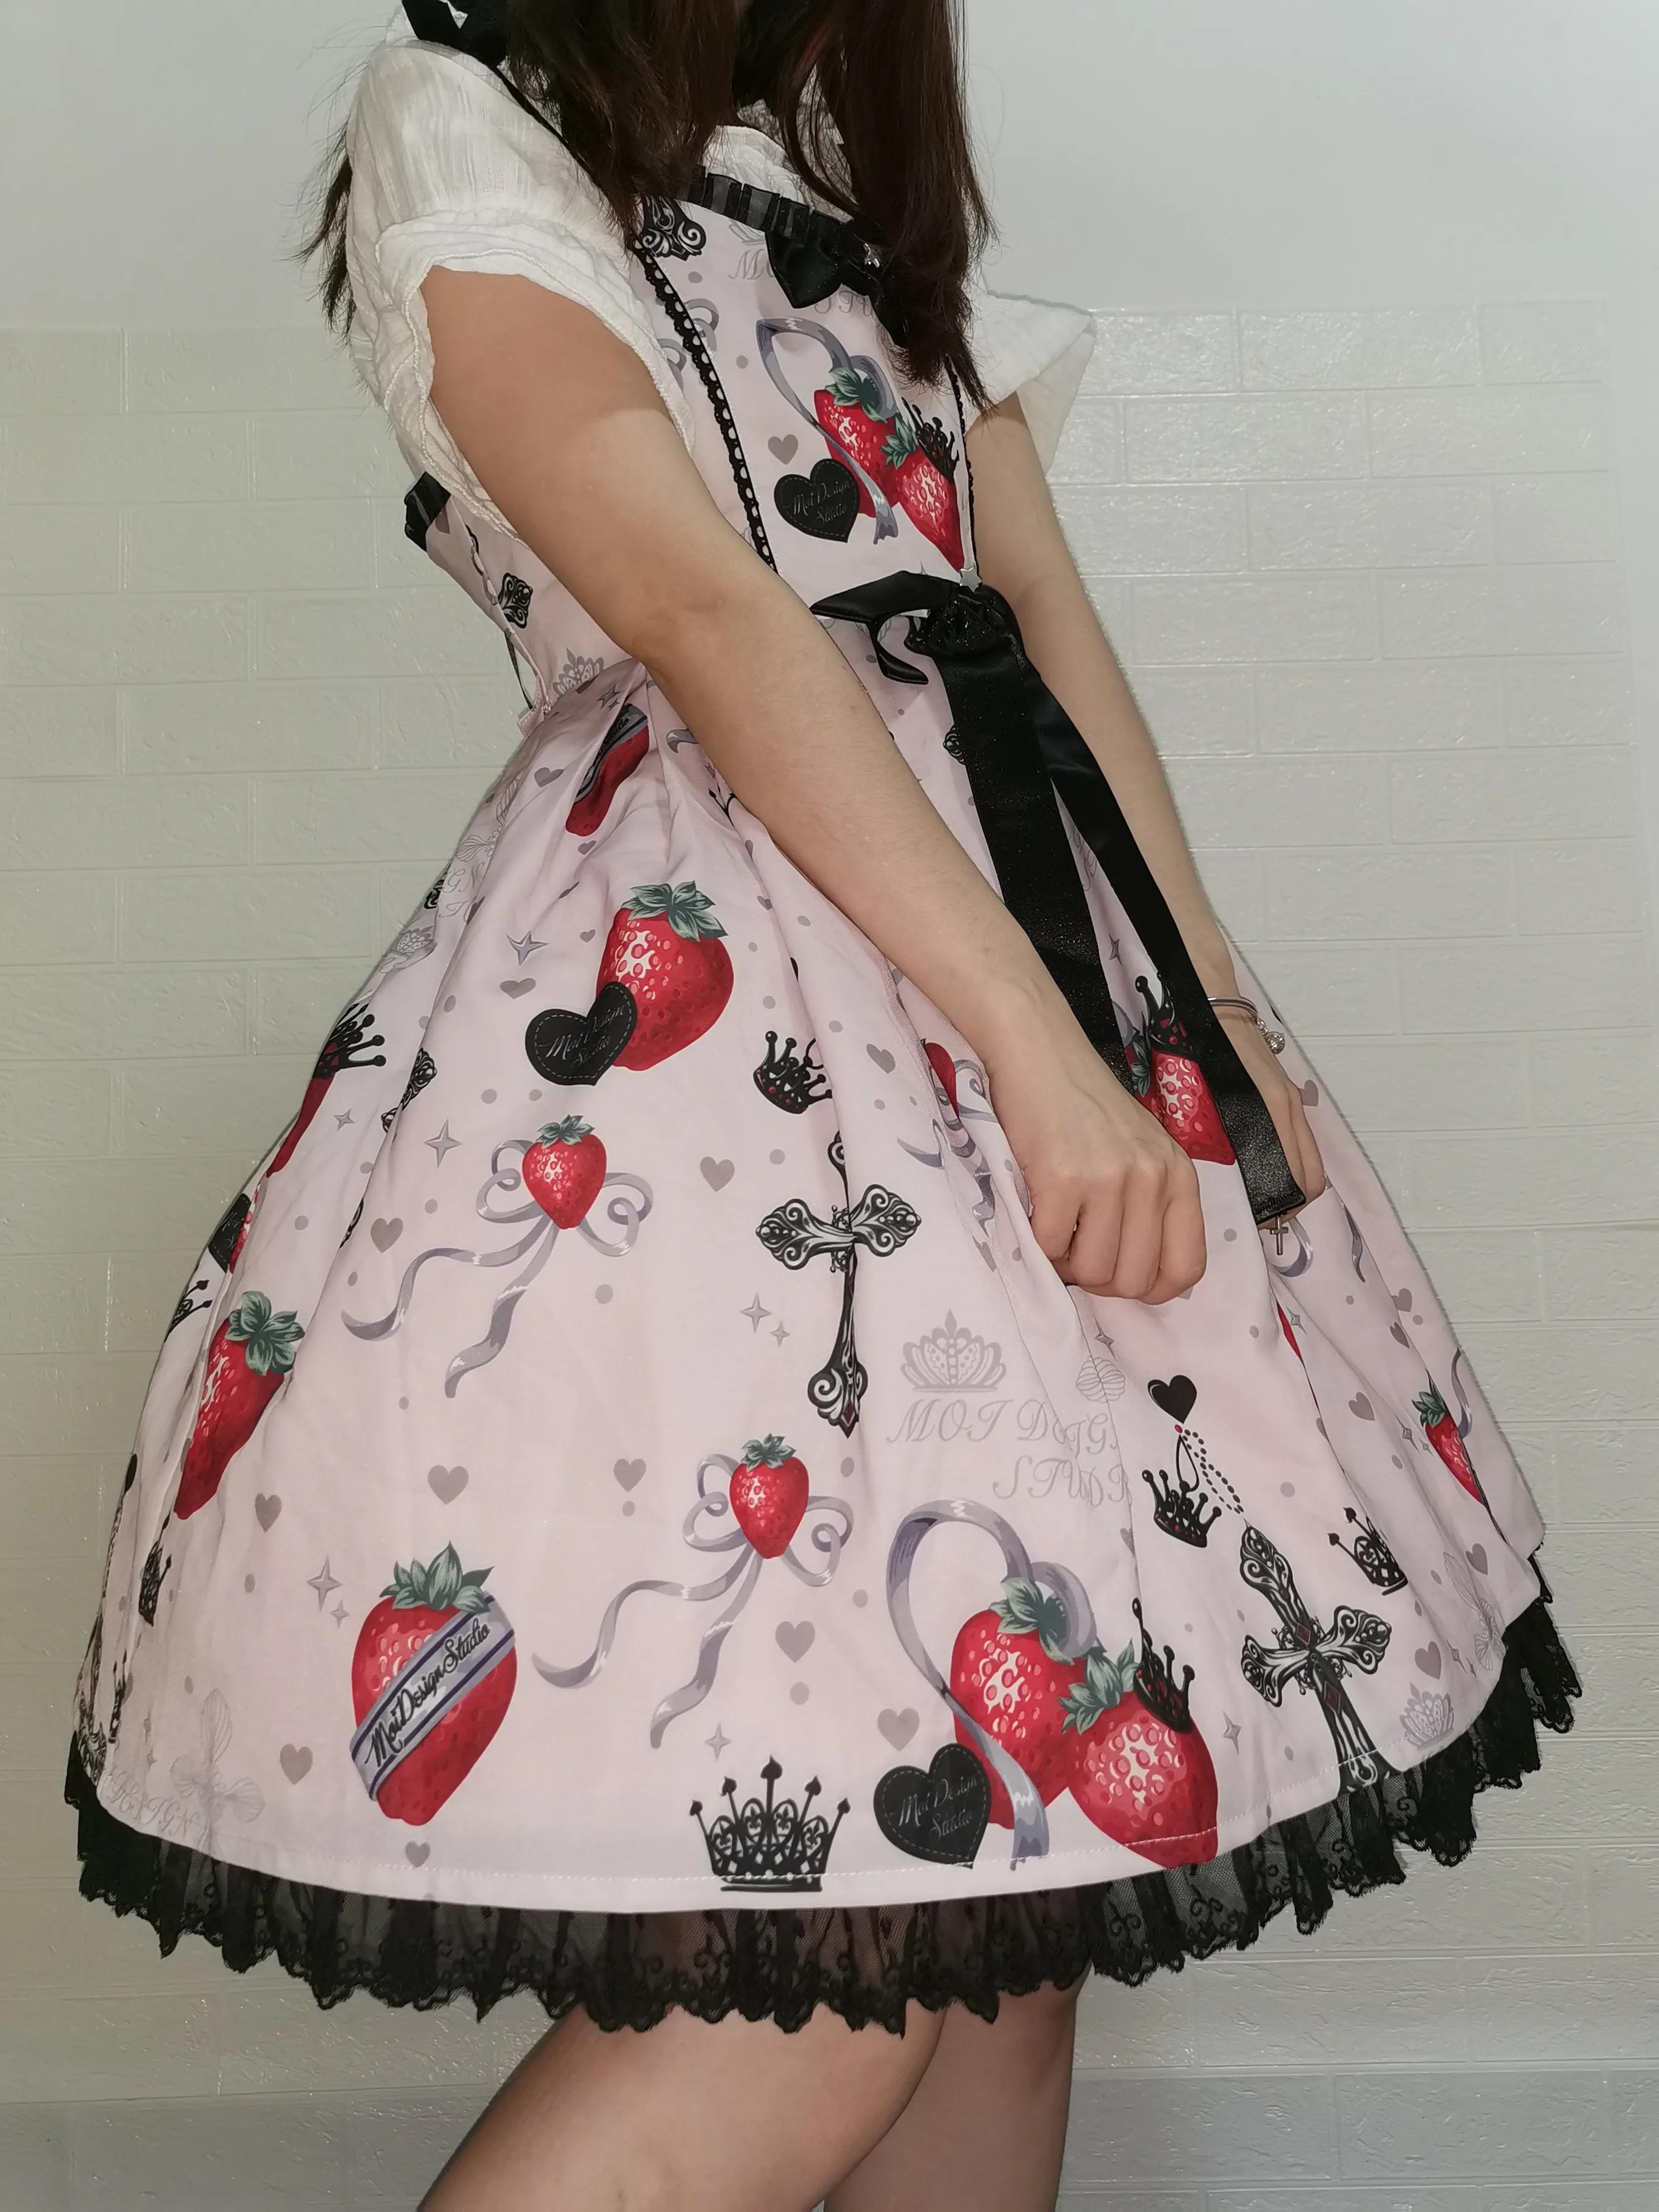 什么是Lolita?